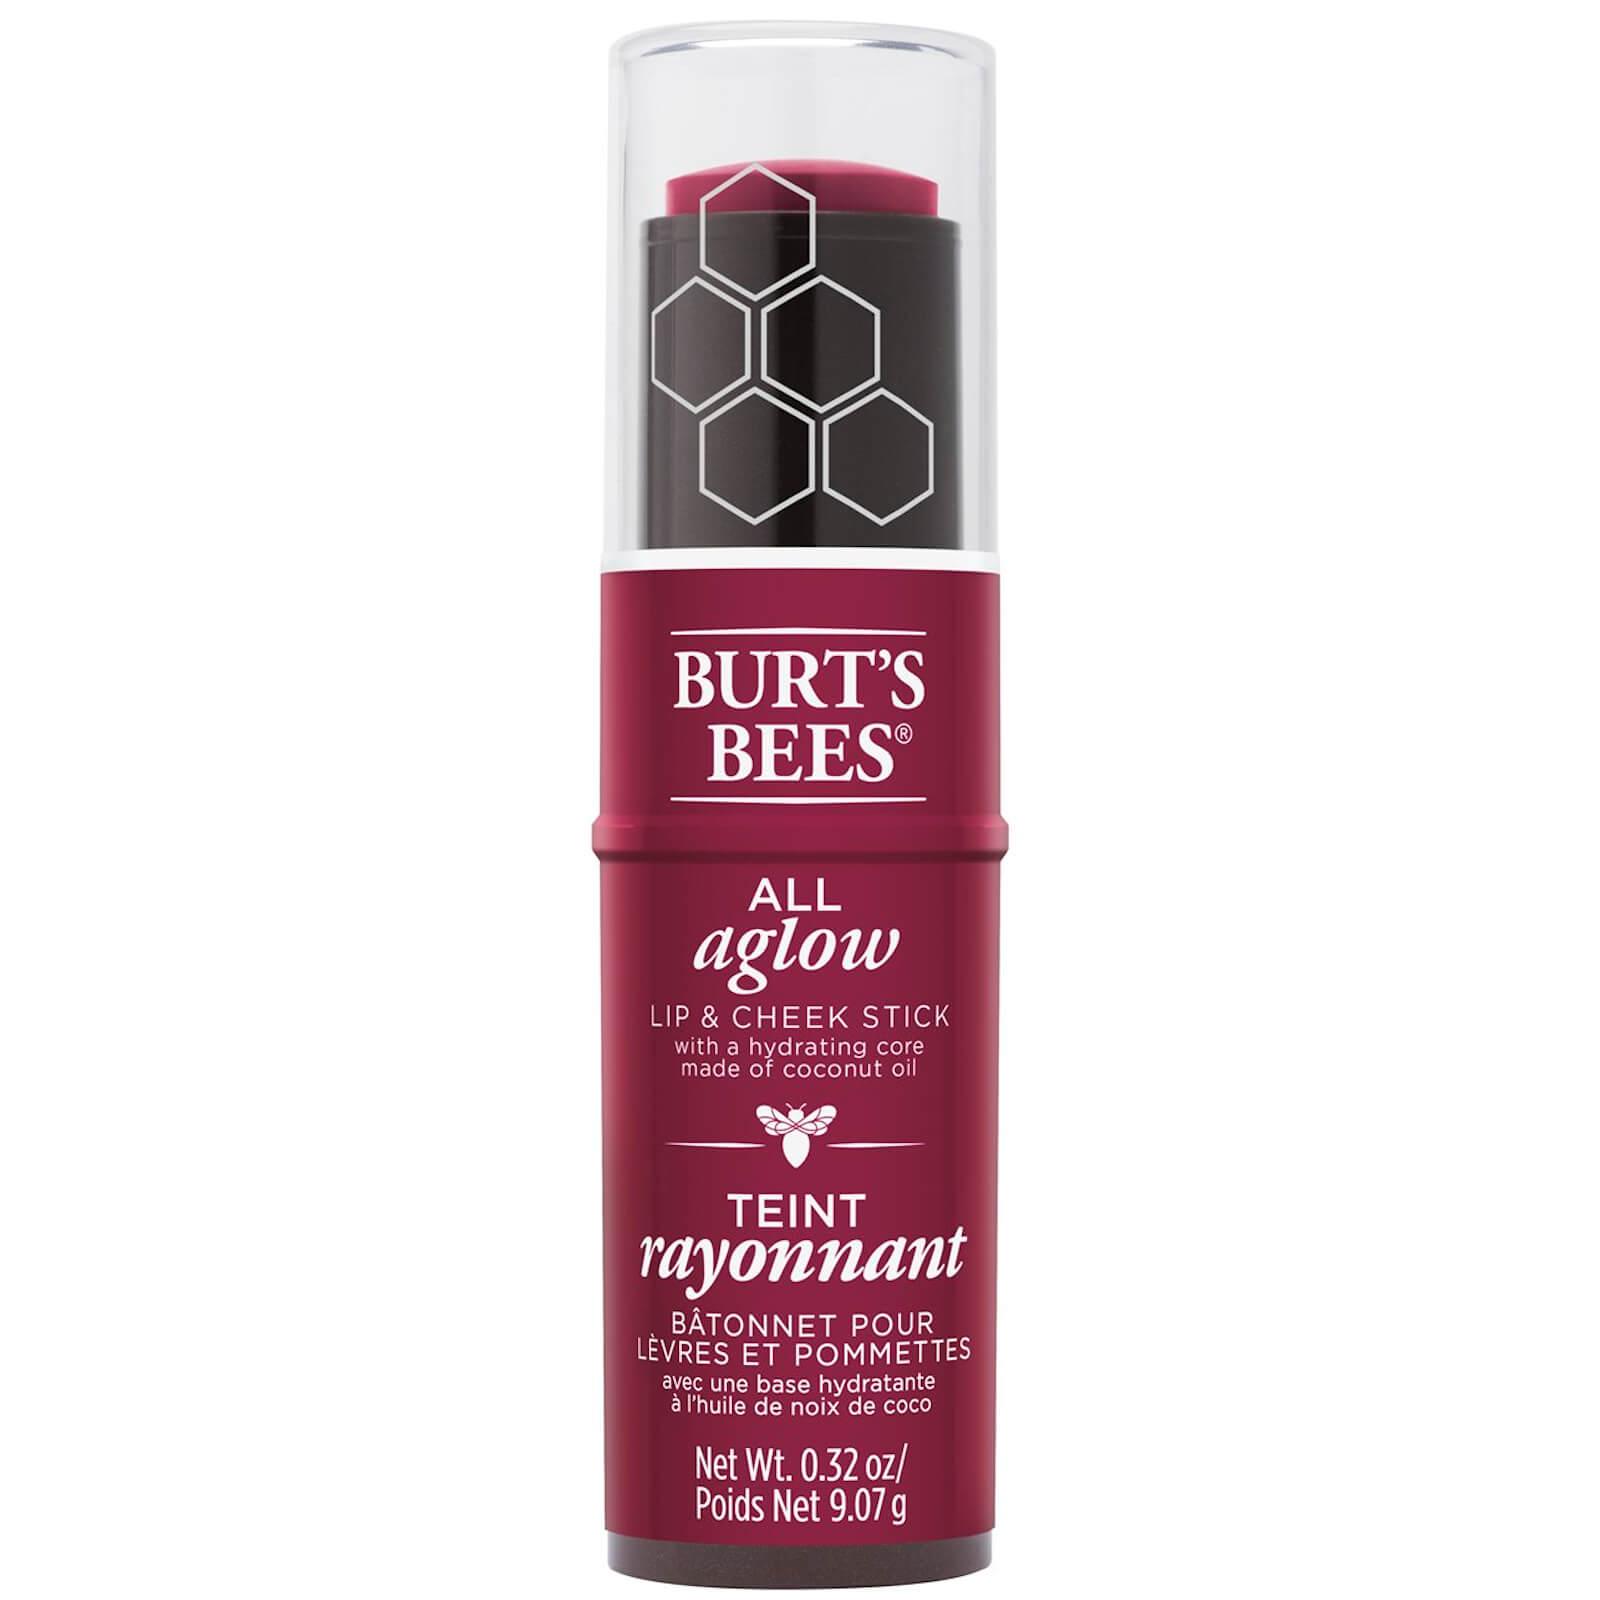 Burt's Bees 100% Natural All Aglow Lip & Cheek Stick 8.5g (Various Shades) - Lilac Lagoon